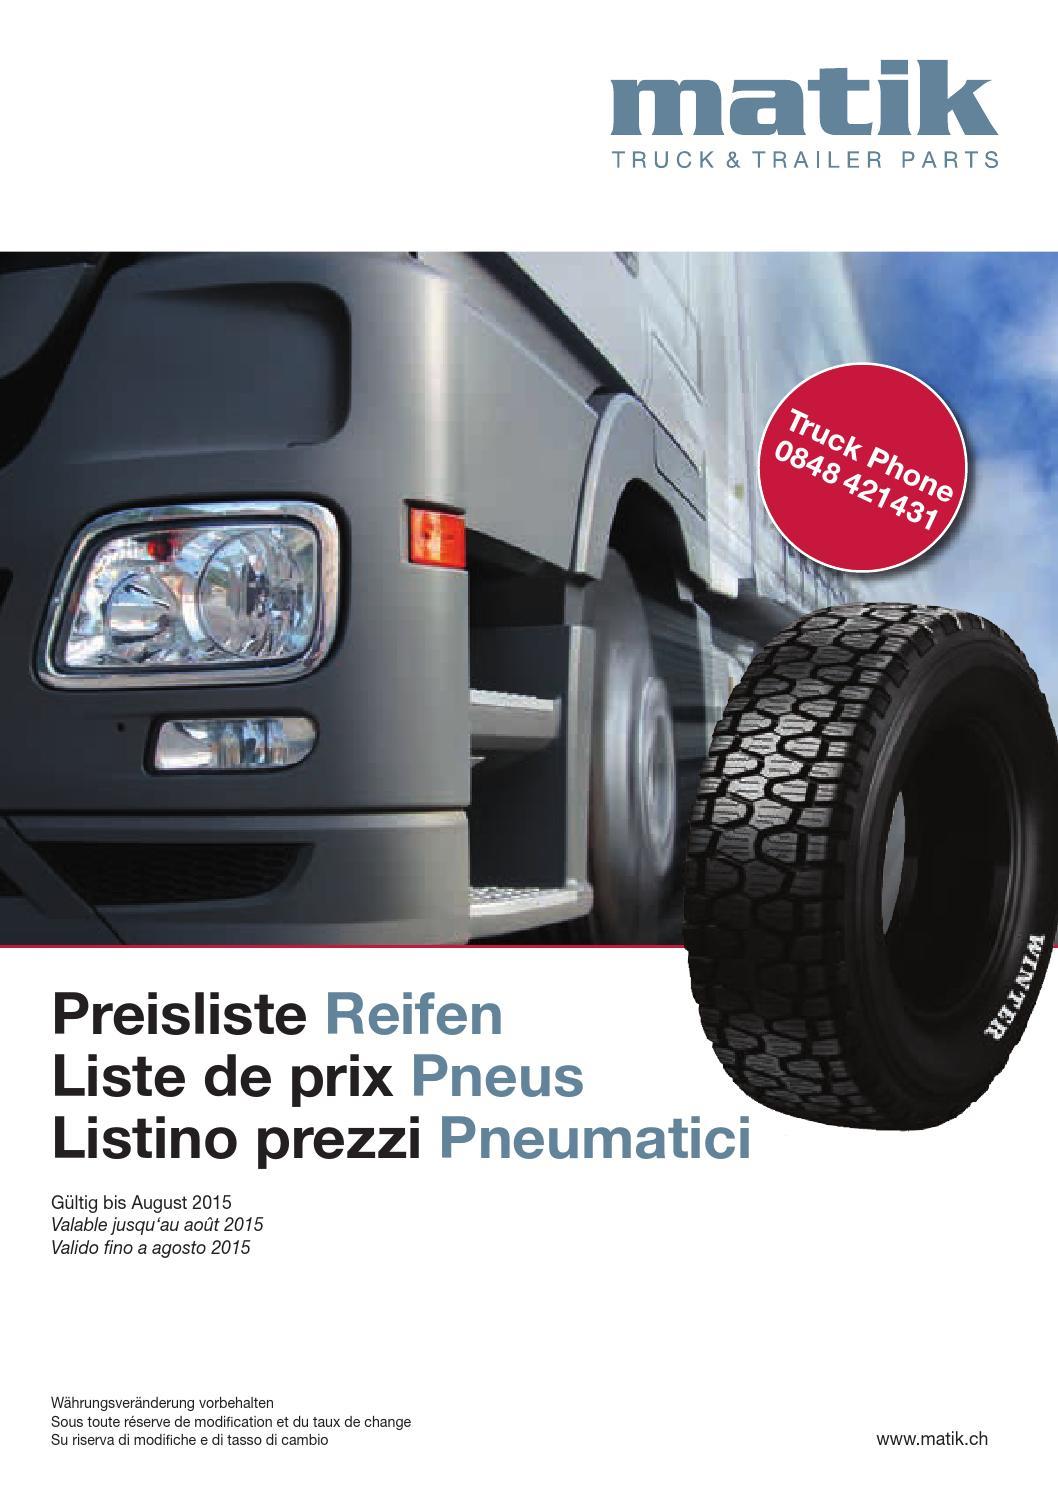 preisliste reifen liste de prix pneus listono prezzi pneumatici by matik ag issuu. Black Bedroom Furniture Sets. Home Design Ideas